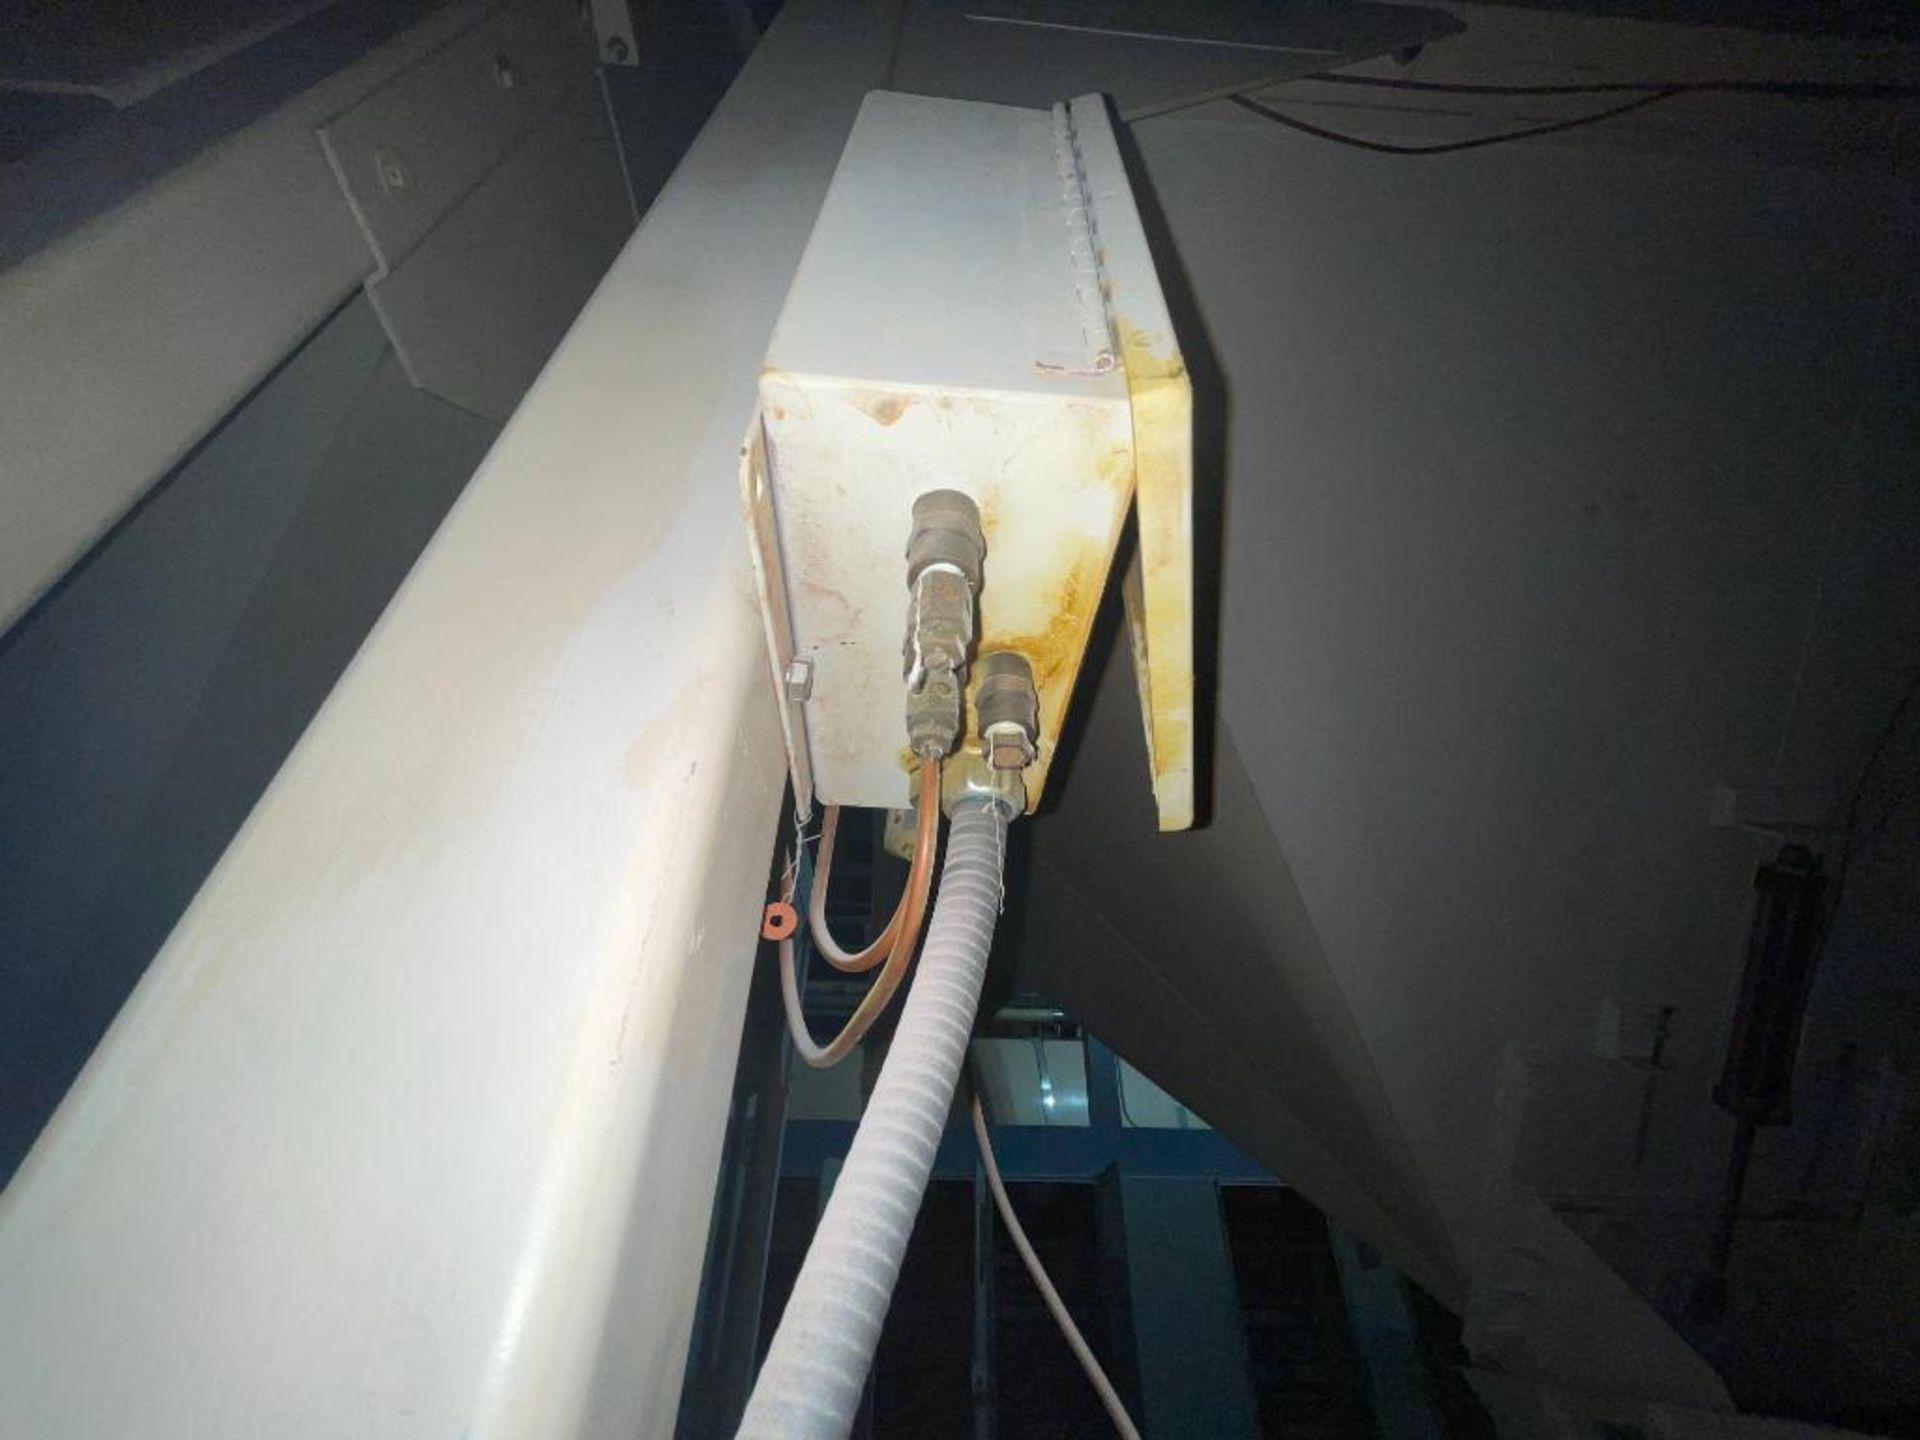 Aseeco mild steel cone bottom bulk storage bin - Image 22 of 28